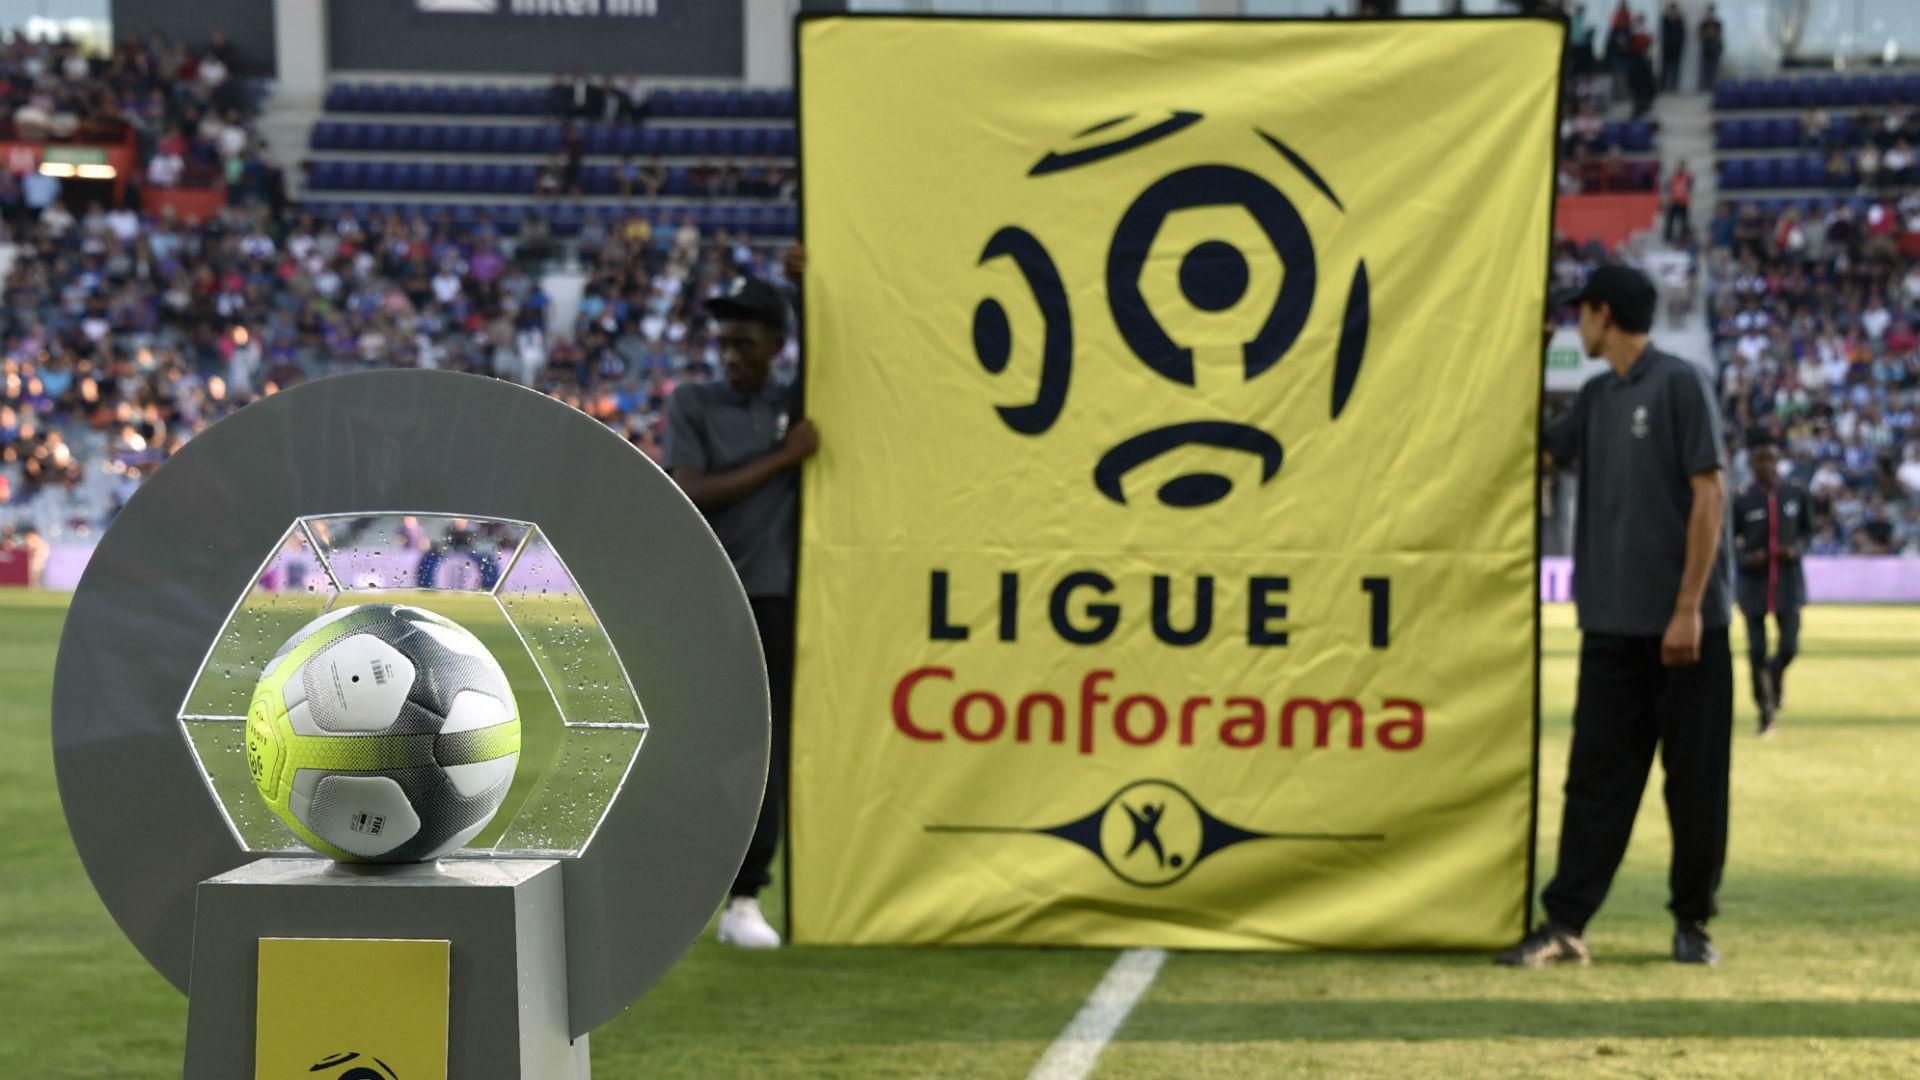 Coronavirus: Ligue 1 goes behind closed doors, no change to US PGA Championship